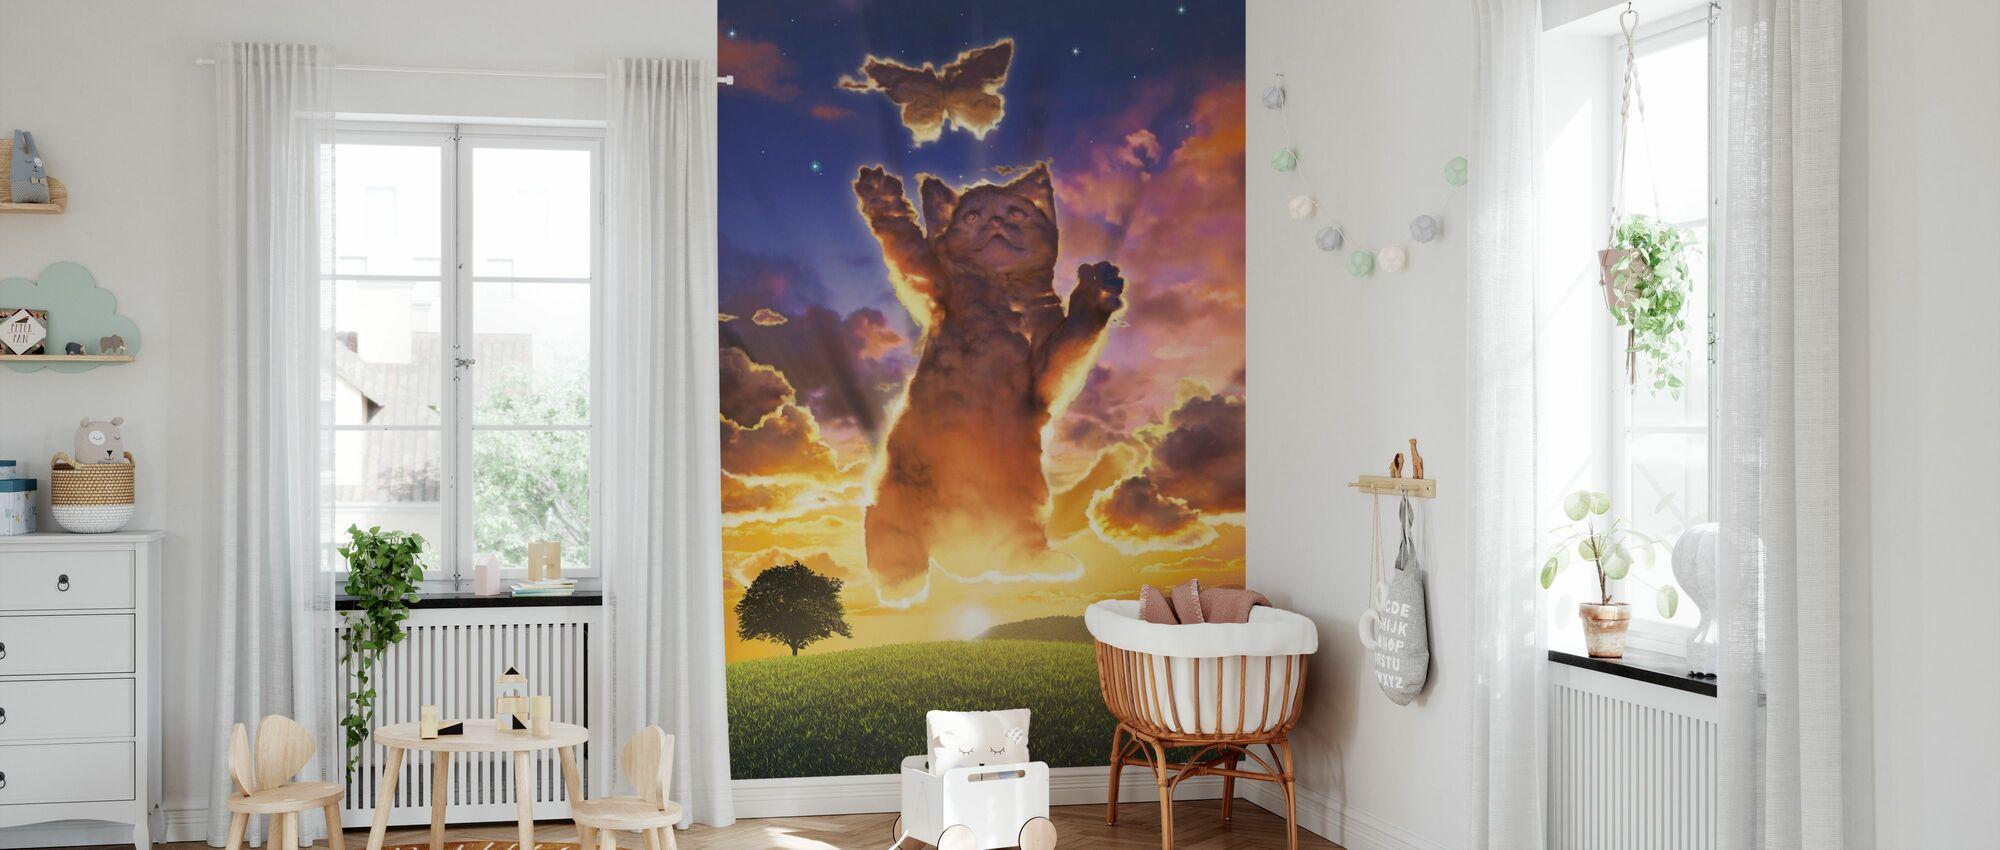 Molnet kattunge solnedgång - Tapet - Babyrum